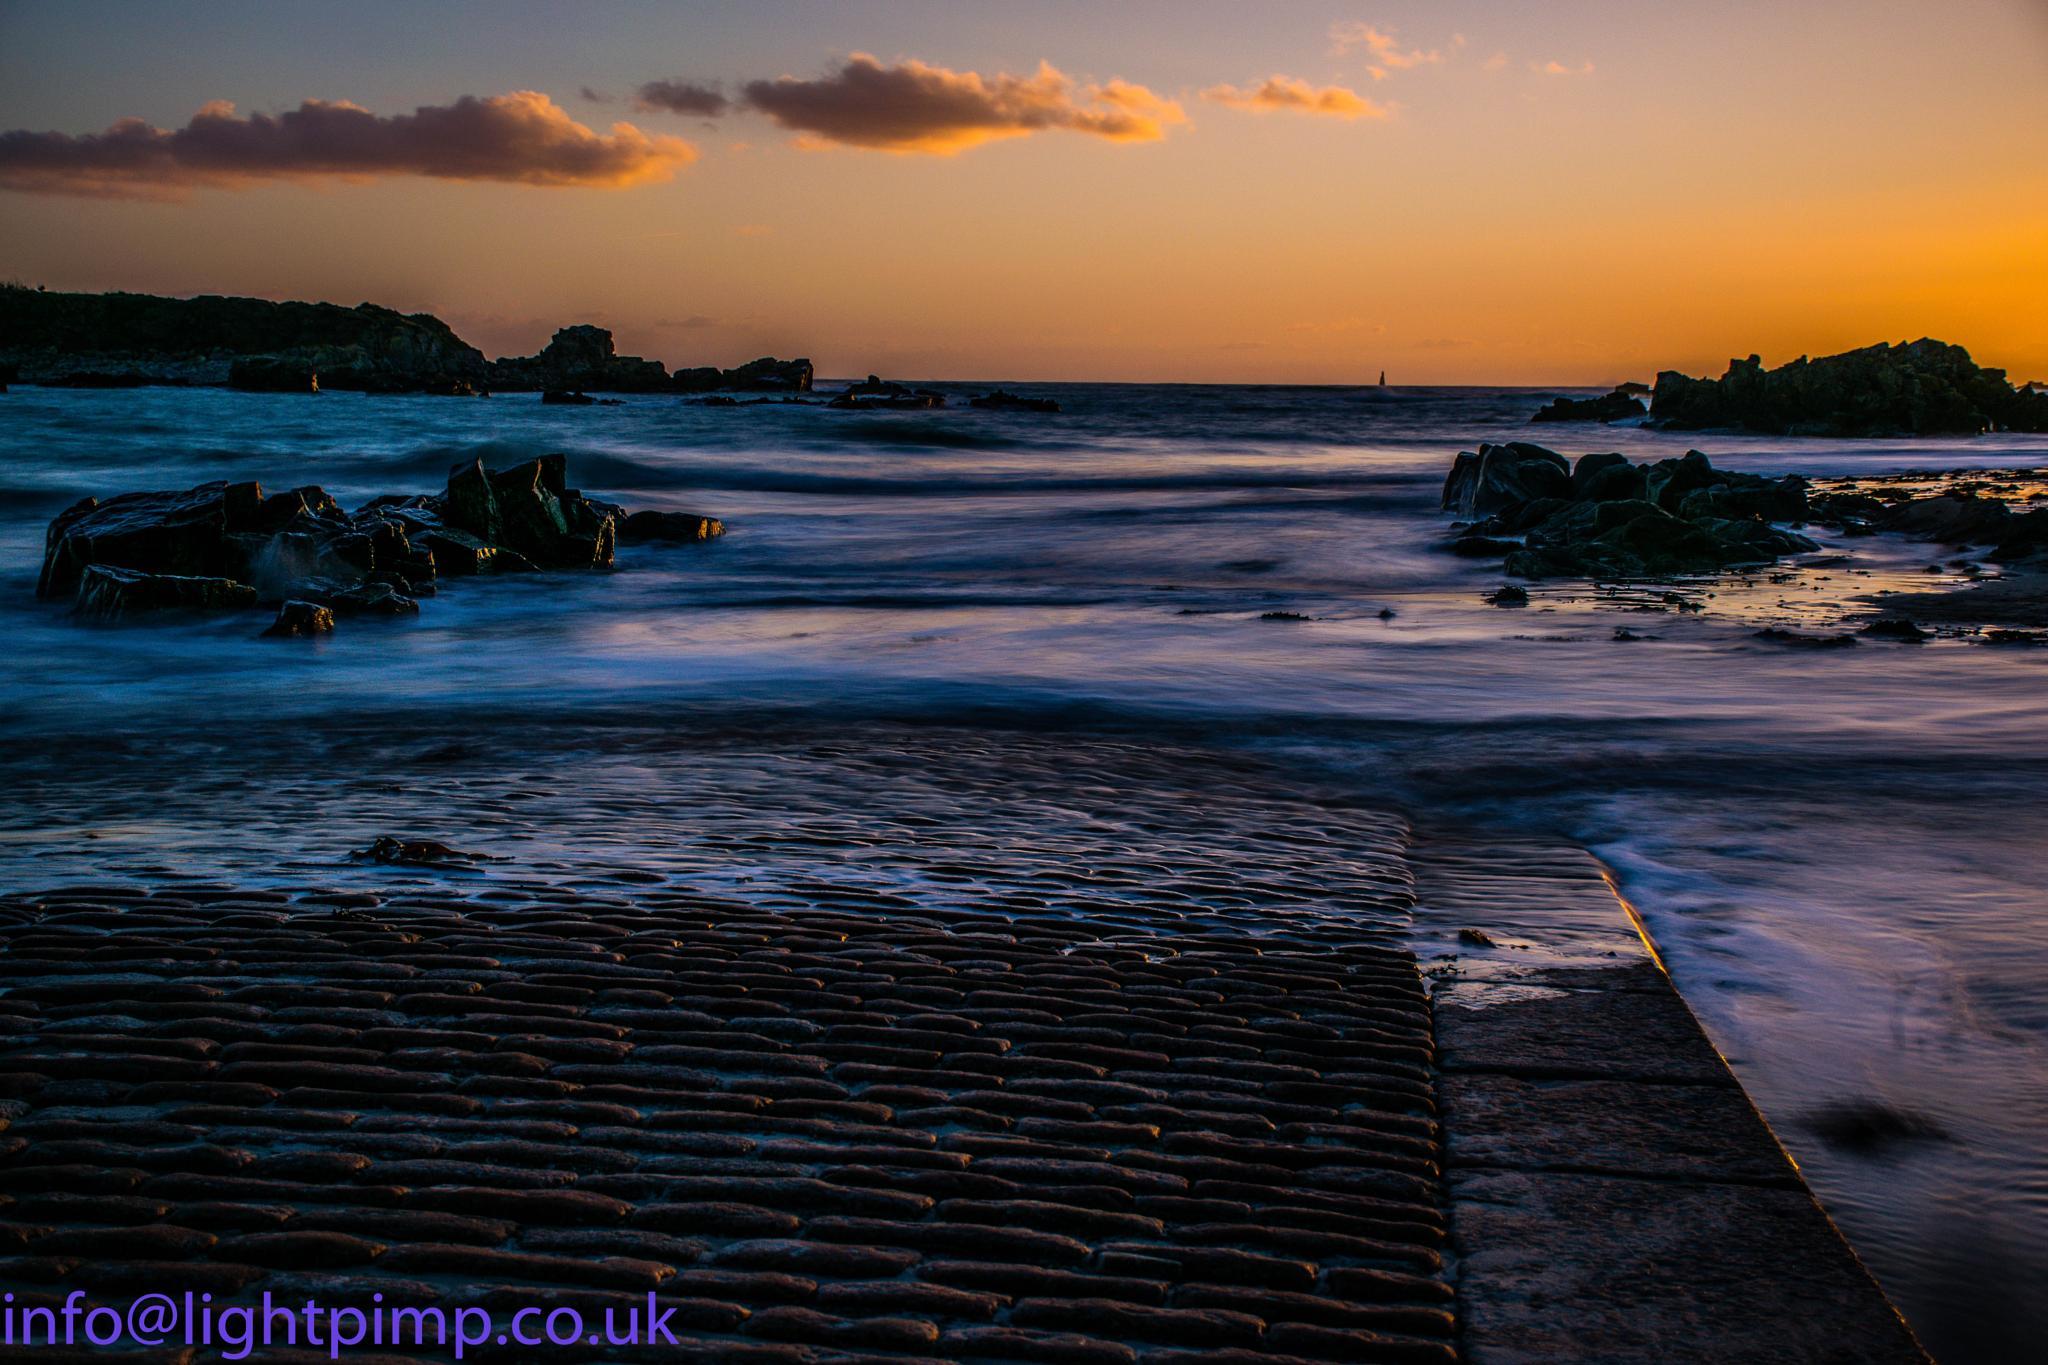 Green Island Sunset by Lightpimp - akadodjer